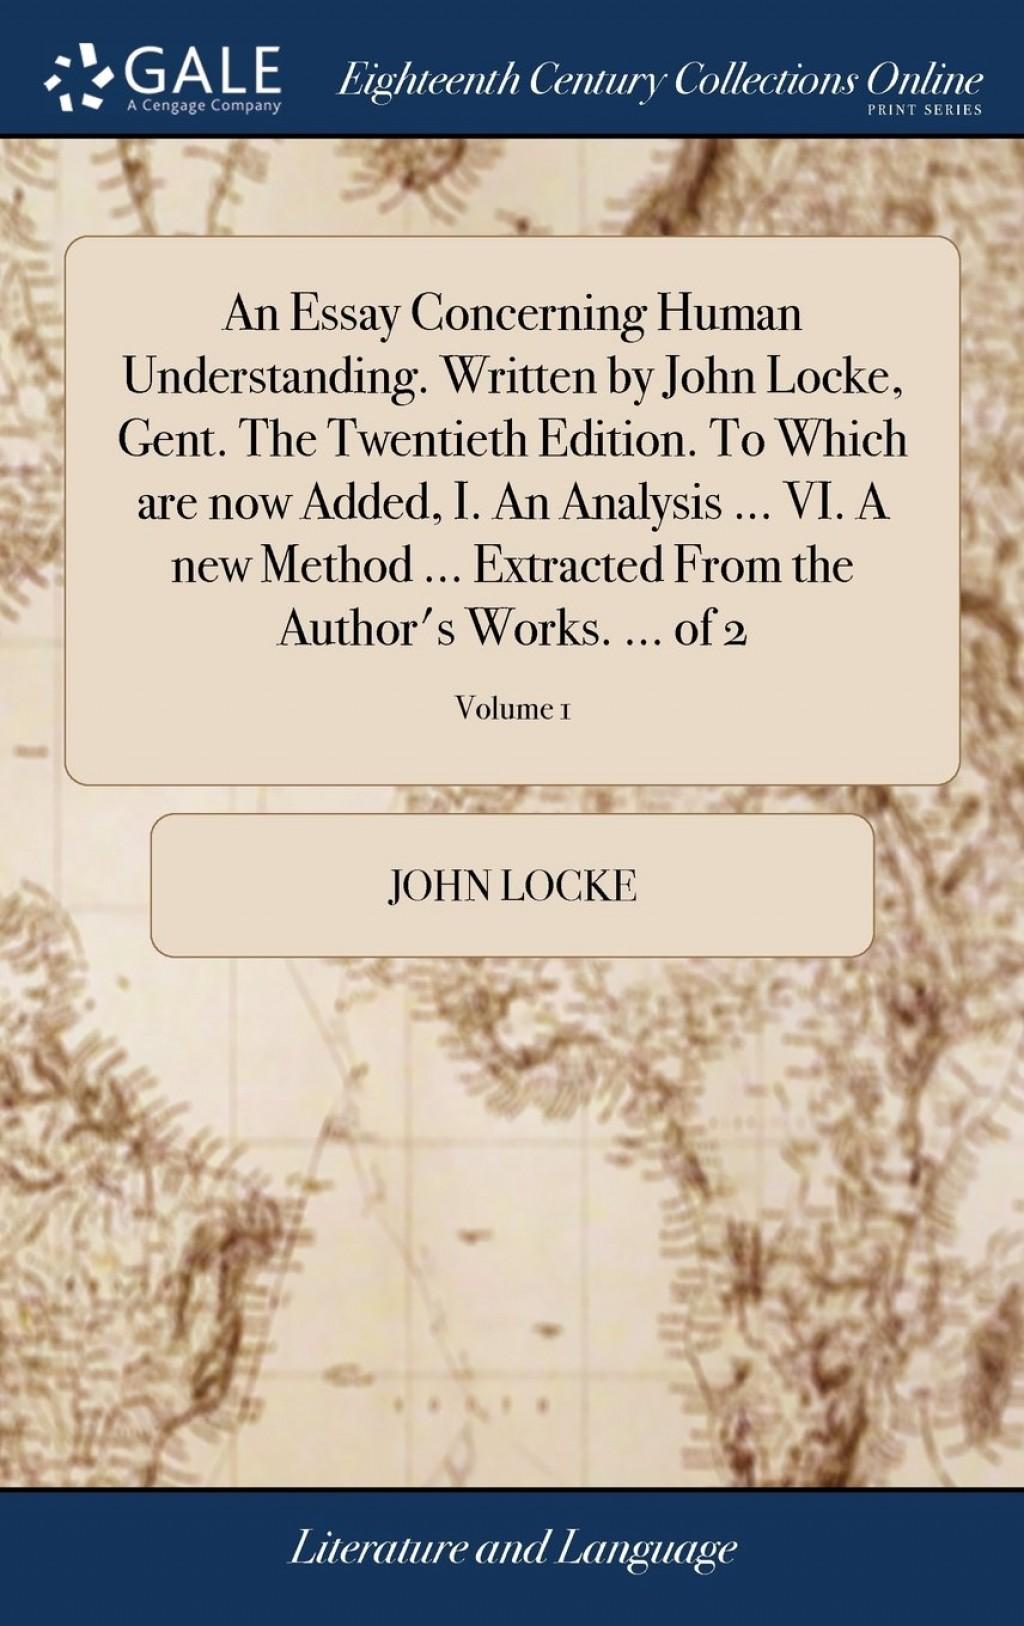 004 John Locke Essay Example Impressive Concerning Human Understanding Book 4 On Pdf Summary Large